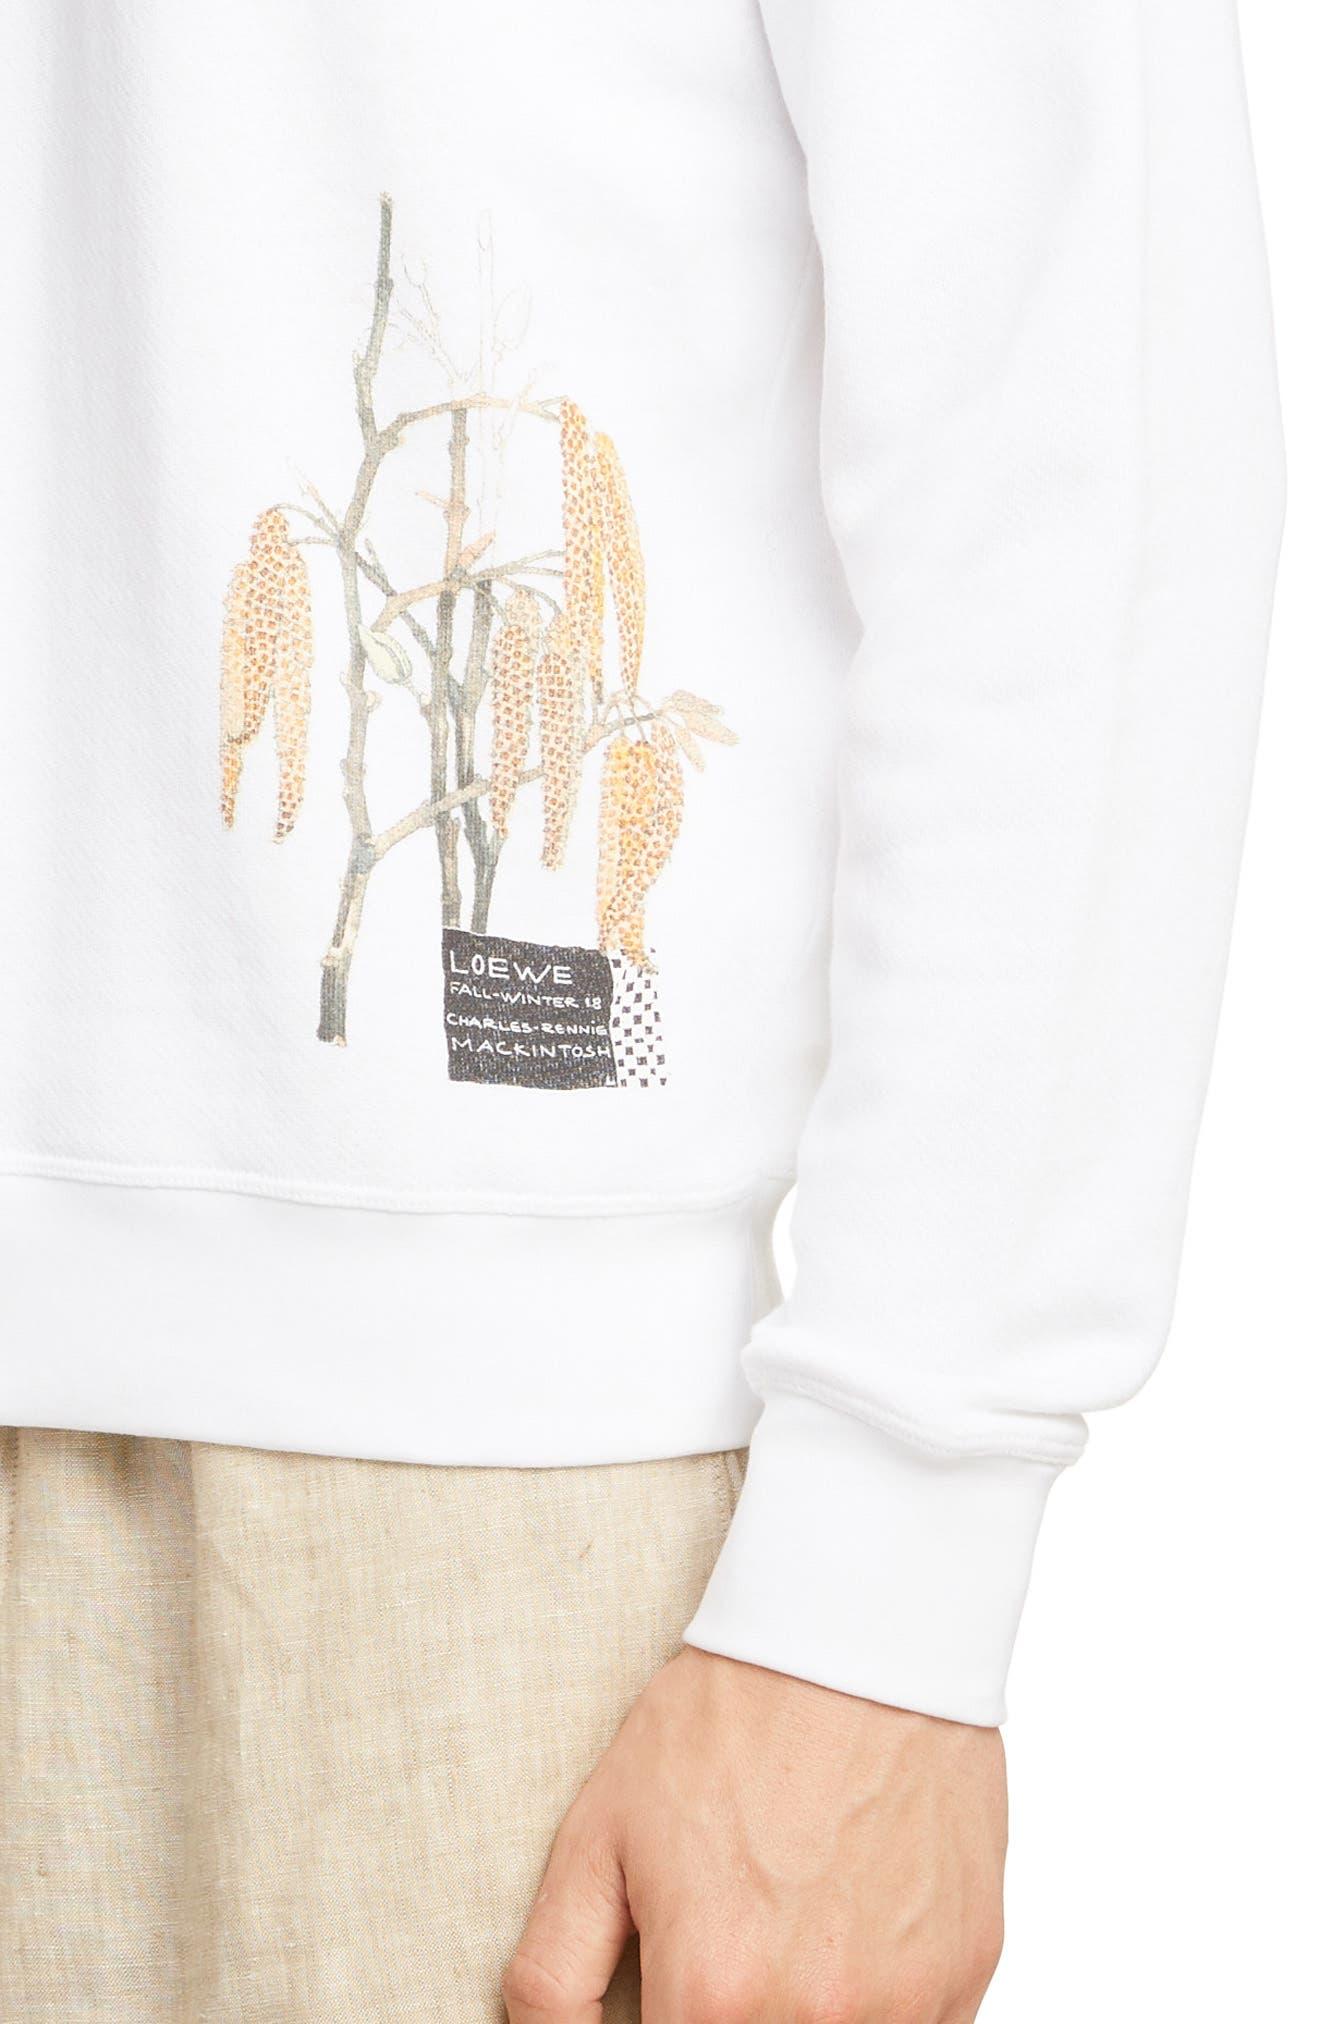 LOEWE, Charles Rennie Mackintosh Collection Botanical Print Sweatshirt, Alternate thumbnail 4, color, 2100-WHITE